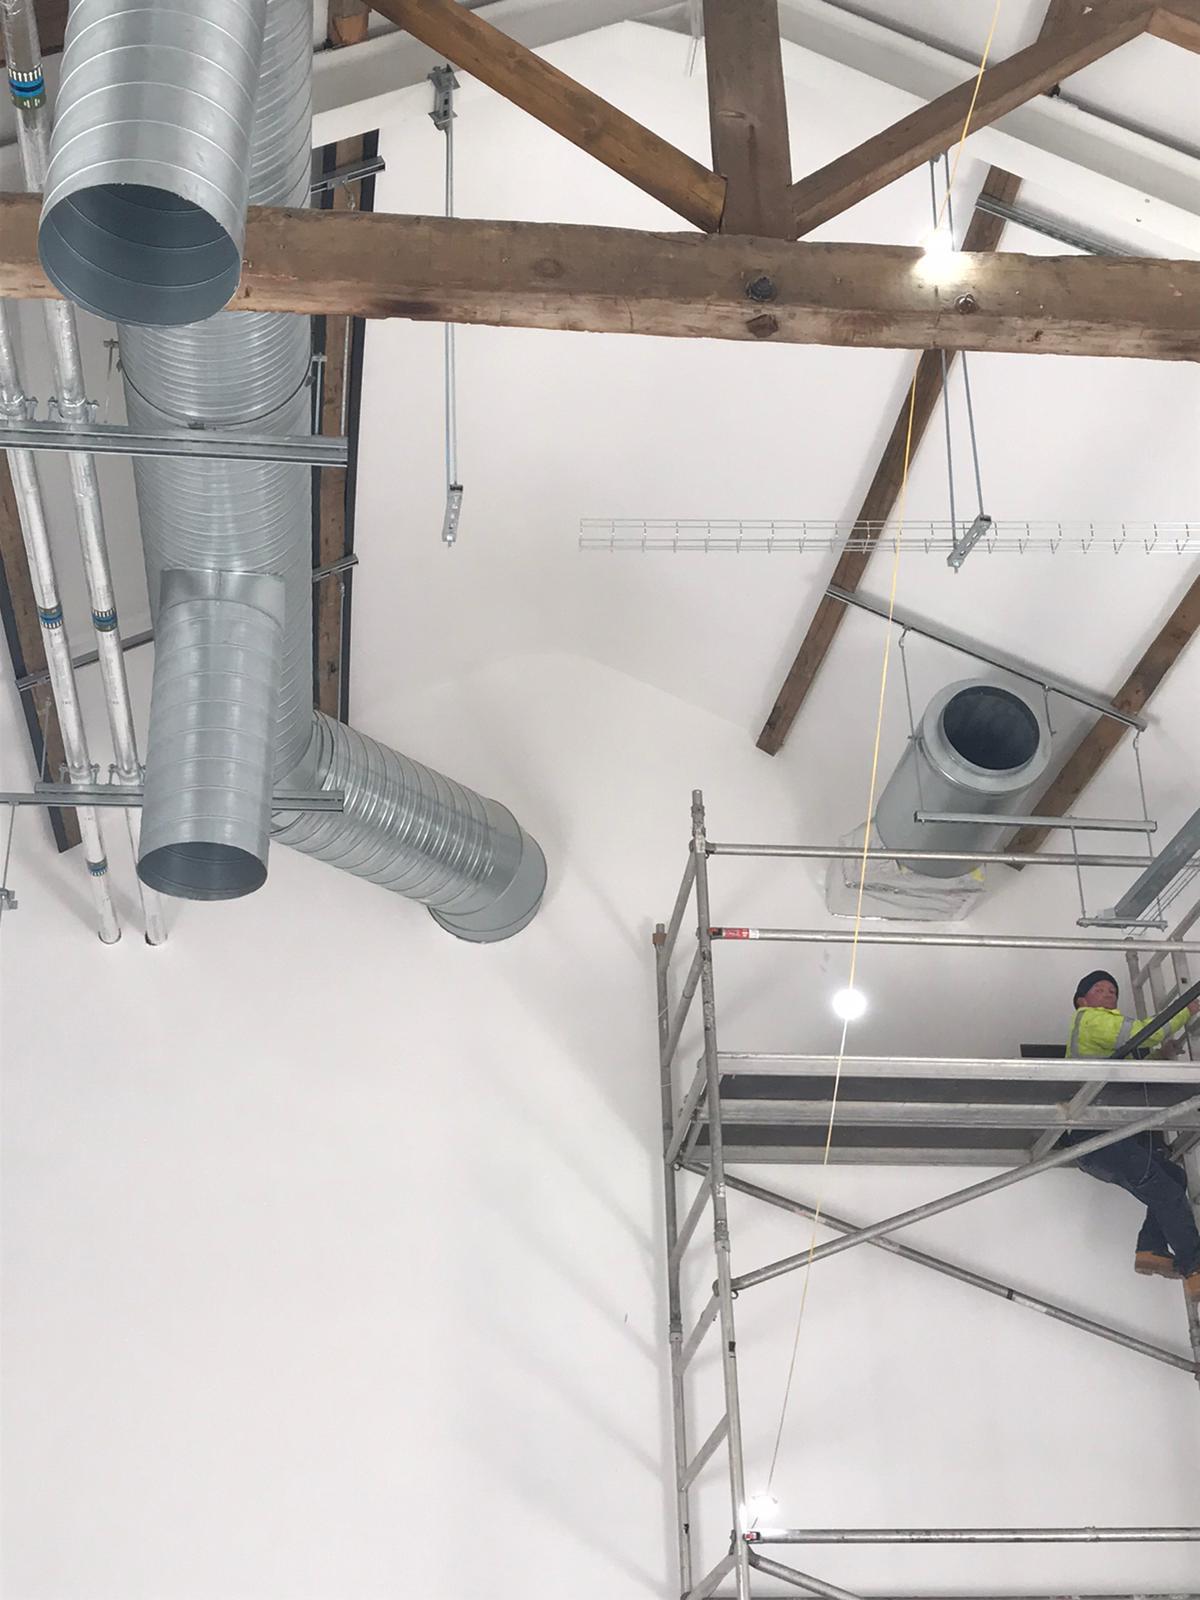 The Whitaker Museum ducting ventilation Lancashire